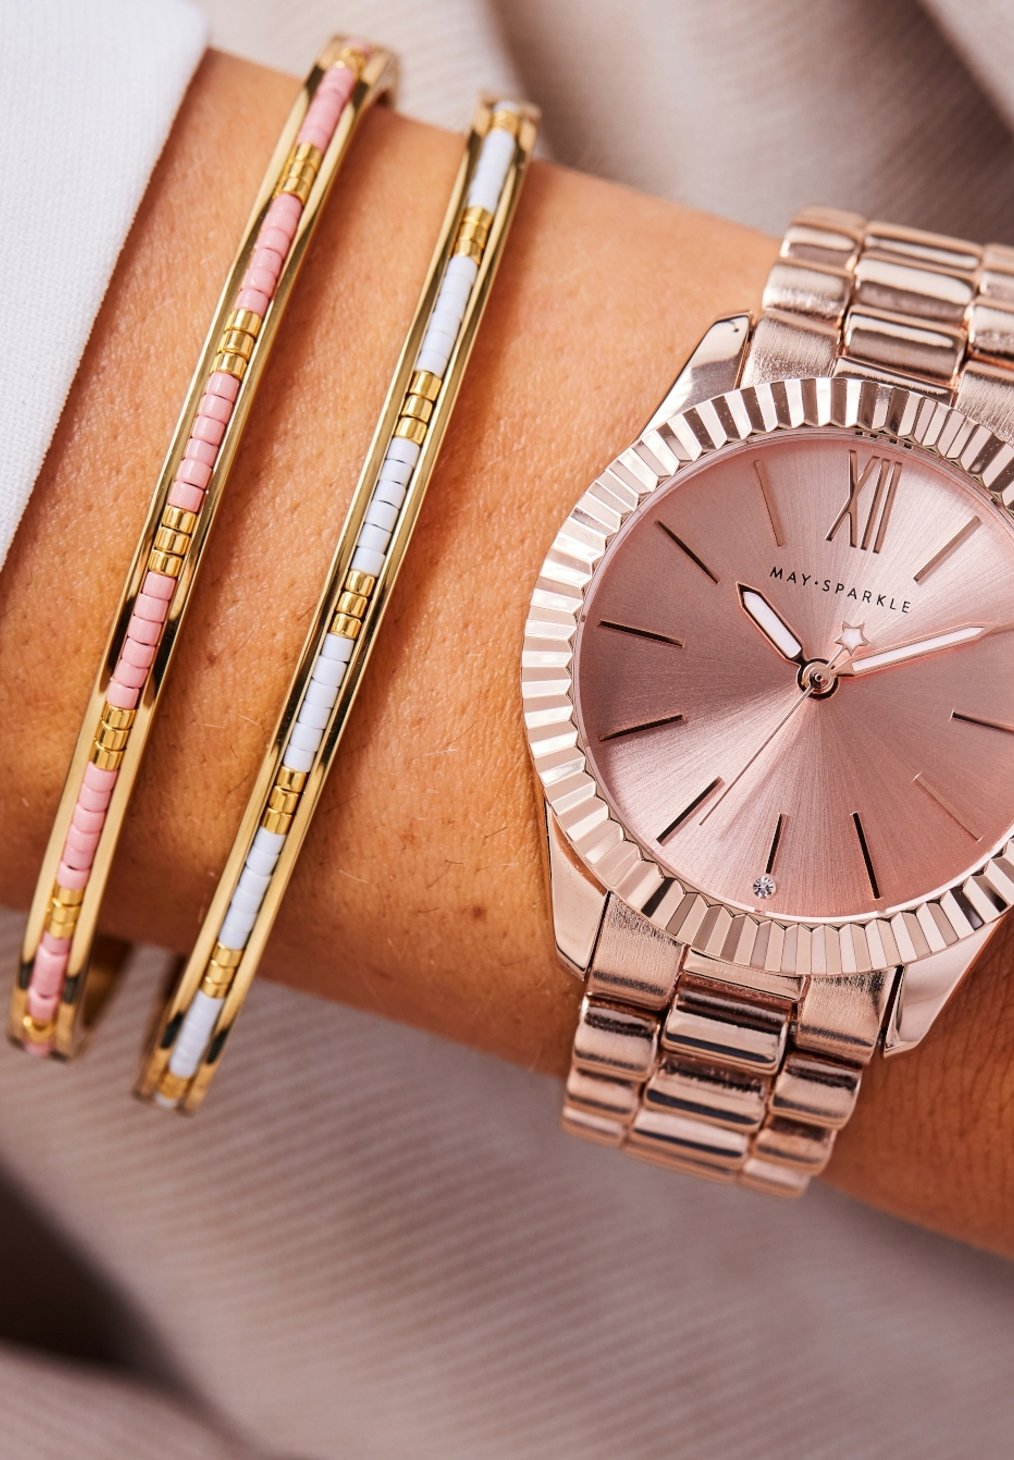 Women MAY SPARKLE  - Bracelet